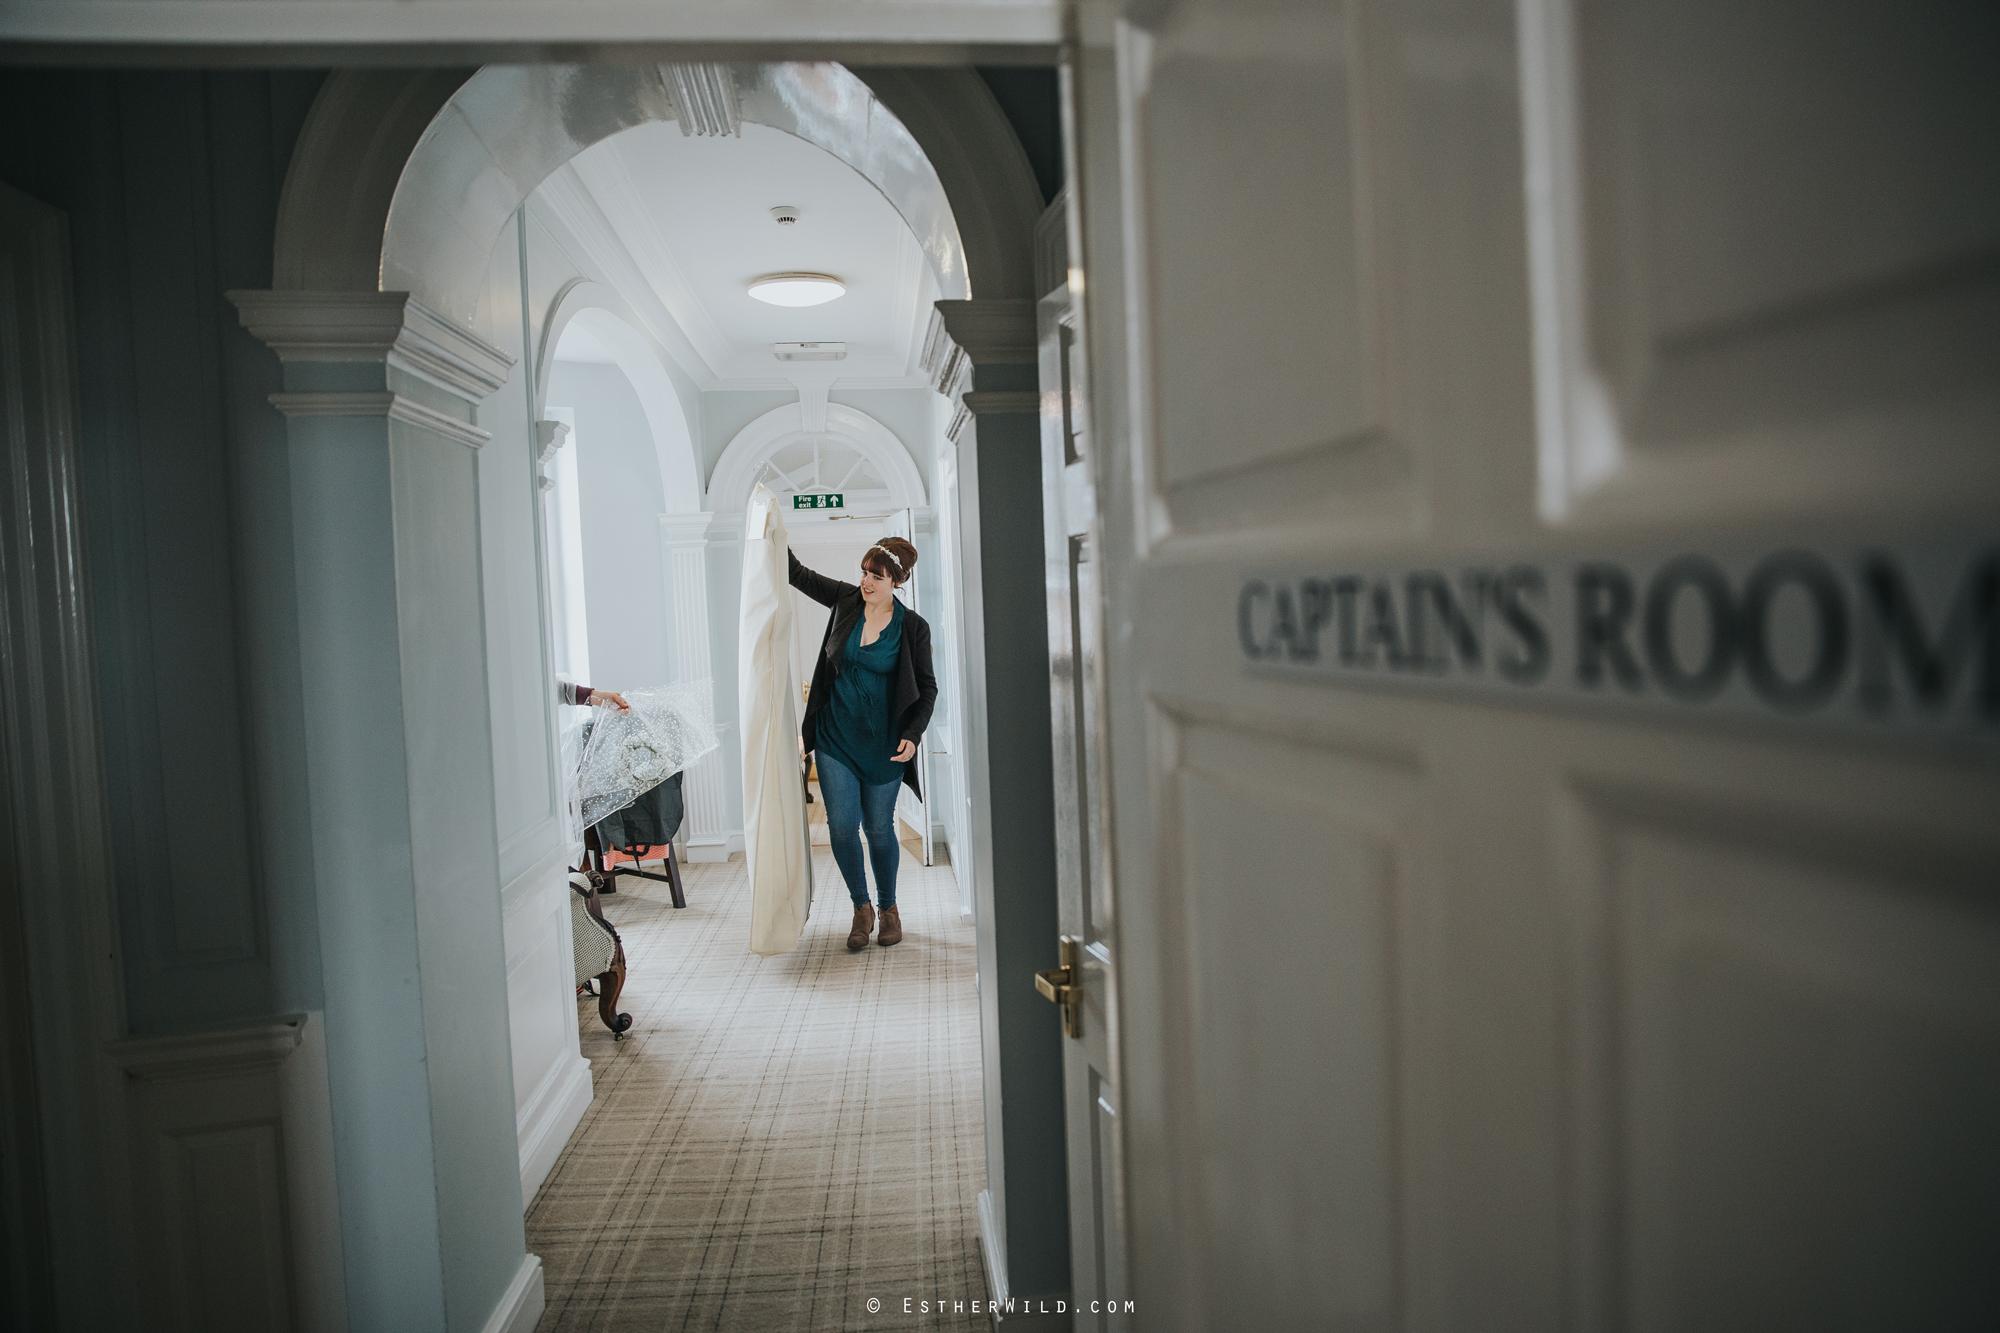 1017_Kings_Lynn_Town_Hall_Bank_House_Hotel_Wedding_Esther_Wild_PhotograpgherKings_Lynn_Town_Hall_Bank_House_Hotel_Wedding_Esther_Wild_PhotograpgherIMG_4304.jpg